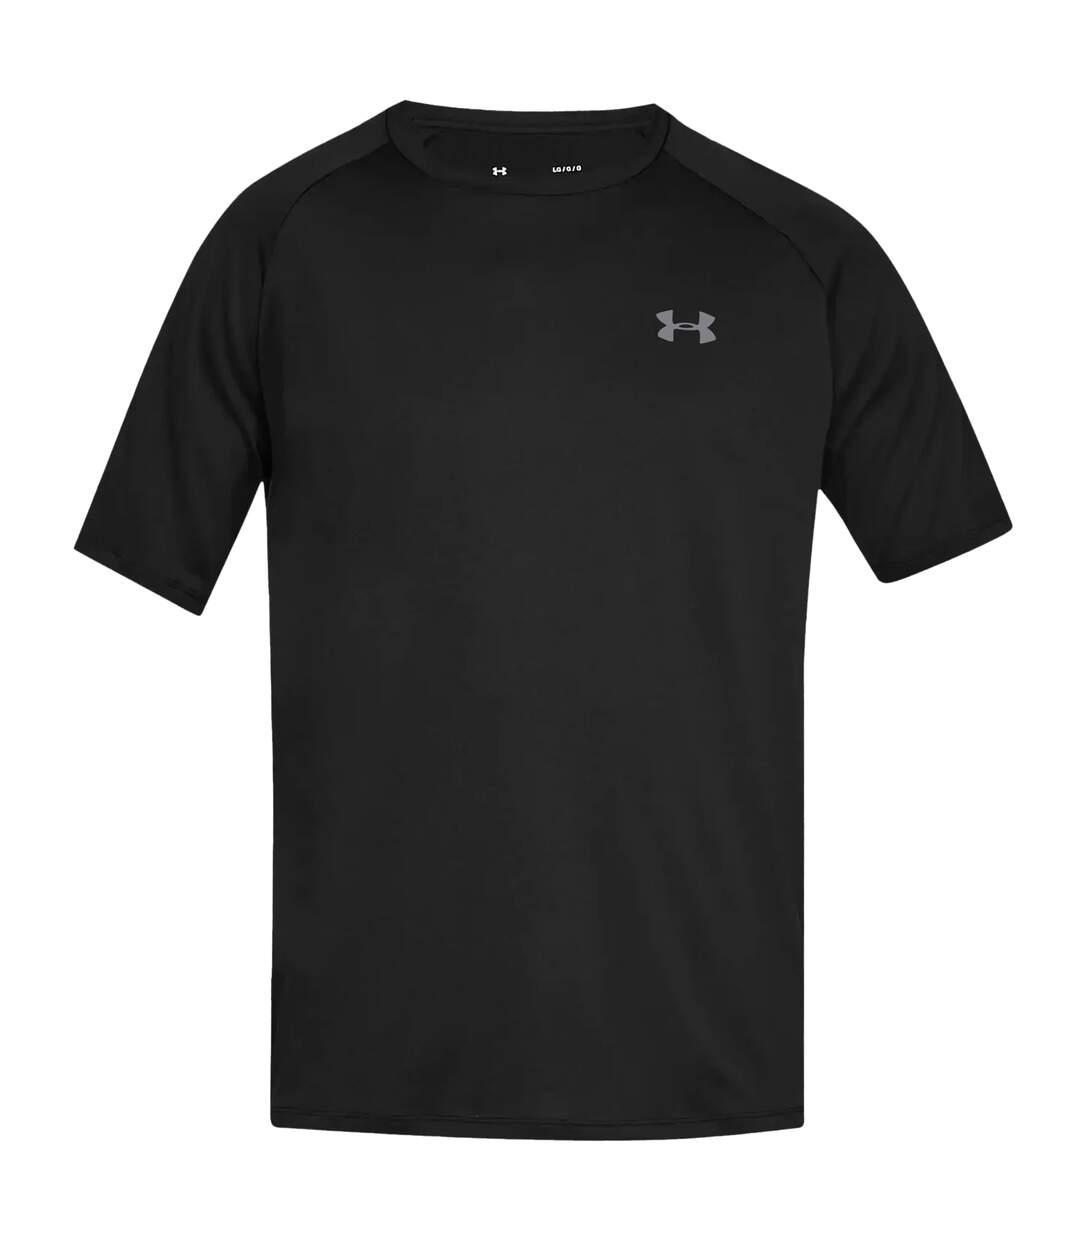 Under Armour Mens Tech T-Shirt (Black) - UTRW7749